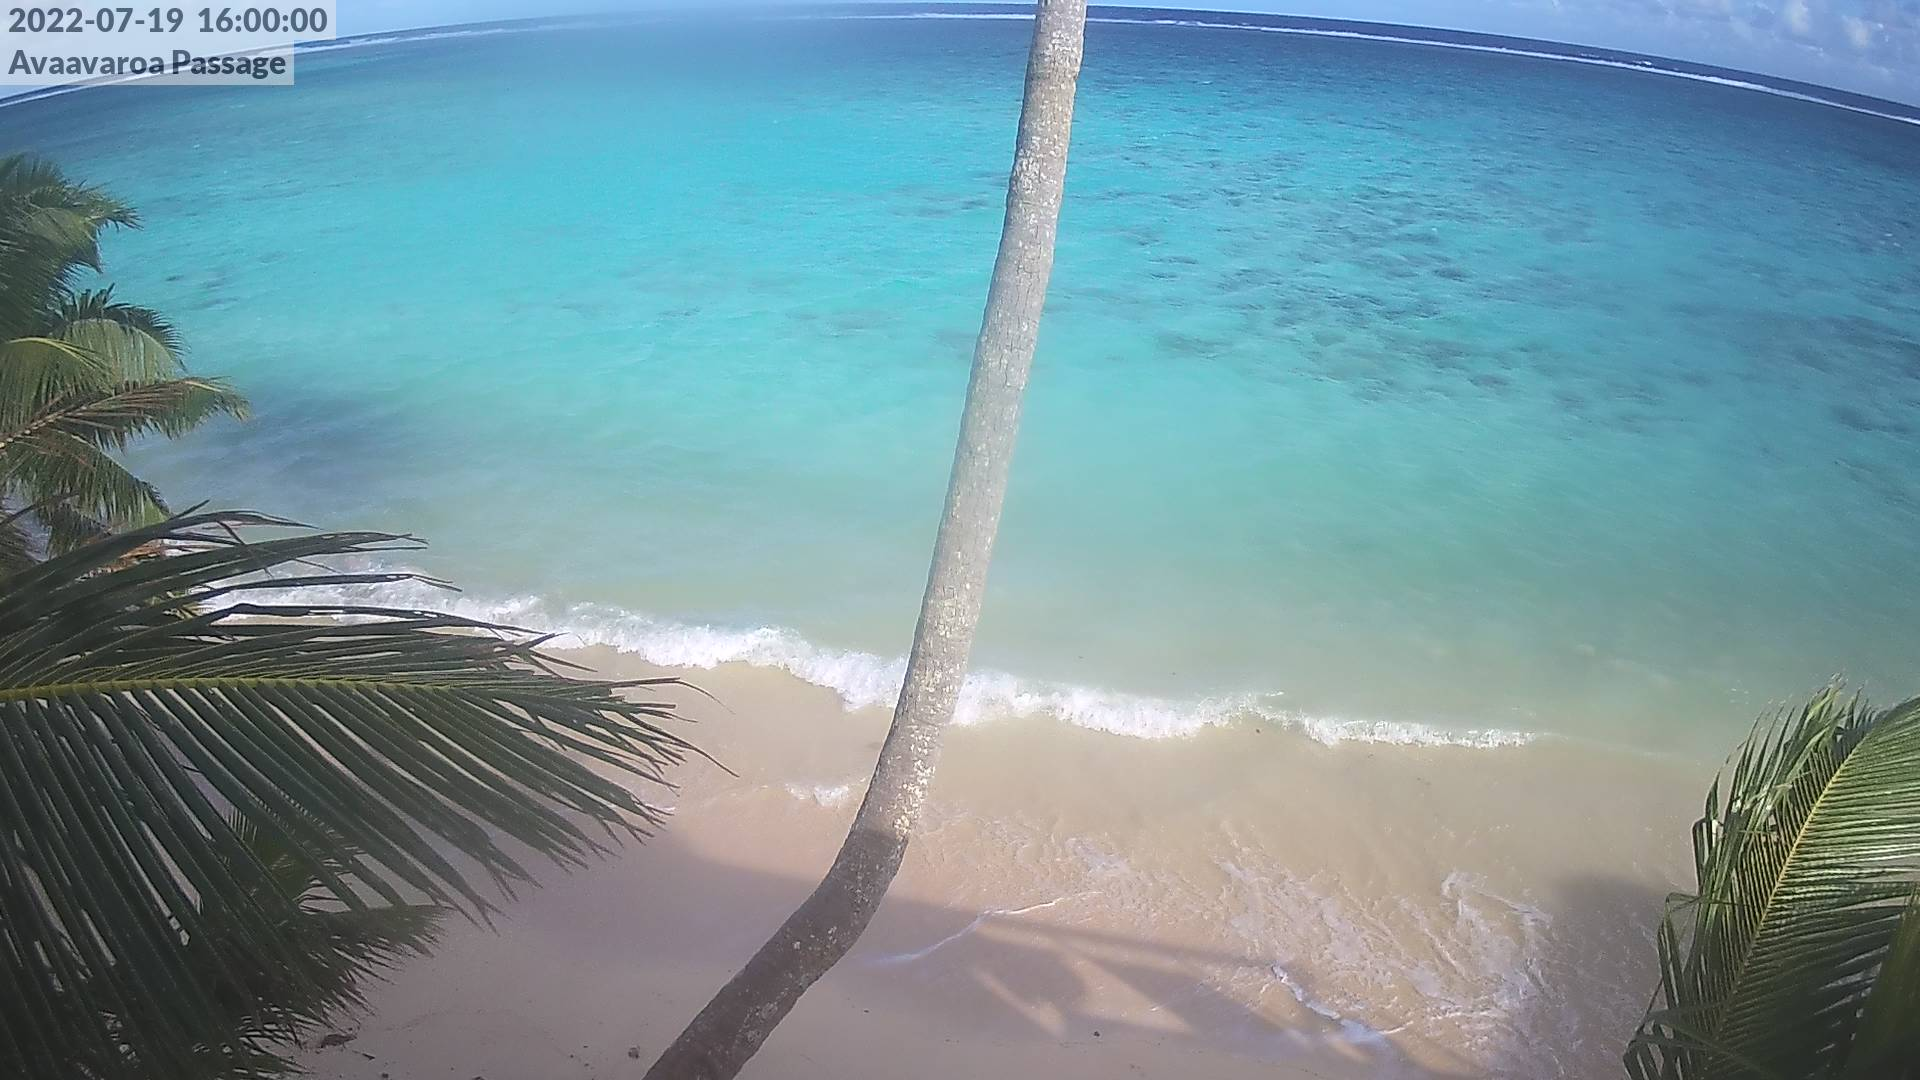 4:00 PM @ Avaavaroa Beach